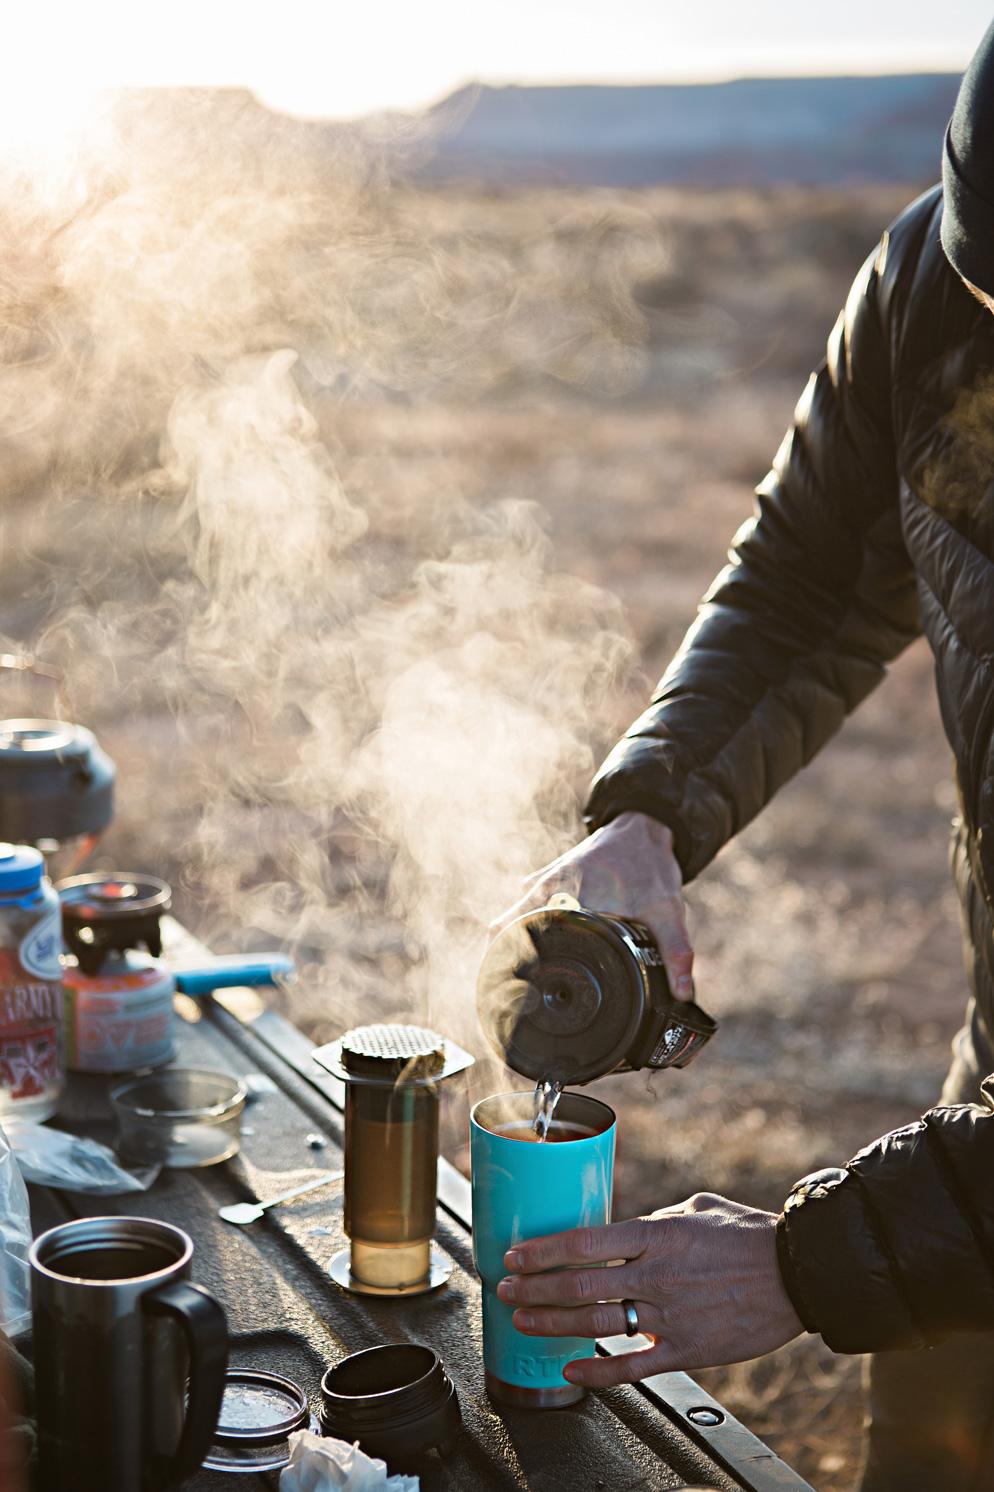 CindyGiovagnoli_Utah_Zion_desert_night_morning_coffee_blm_land_off_grid-008.jpg